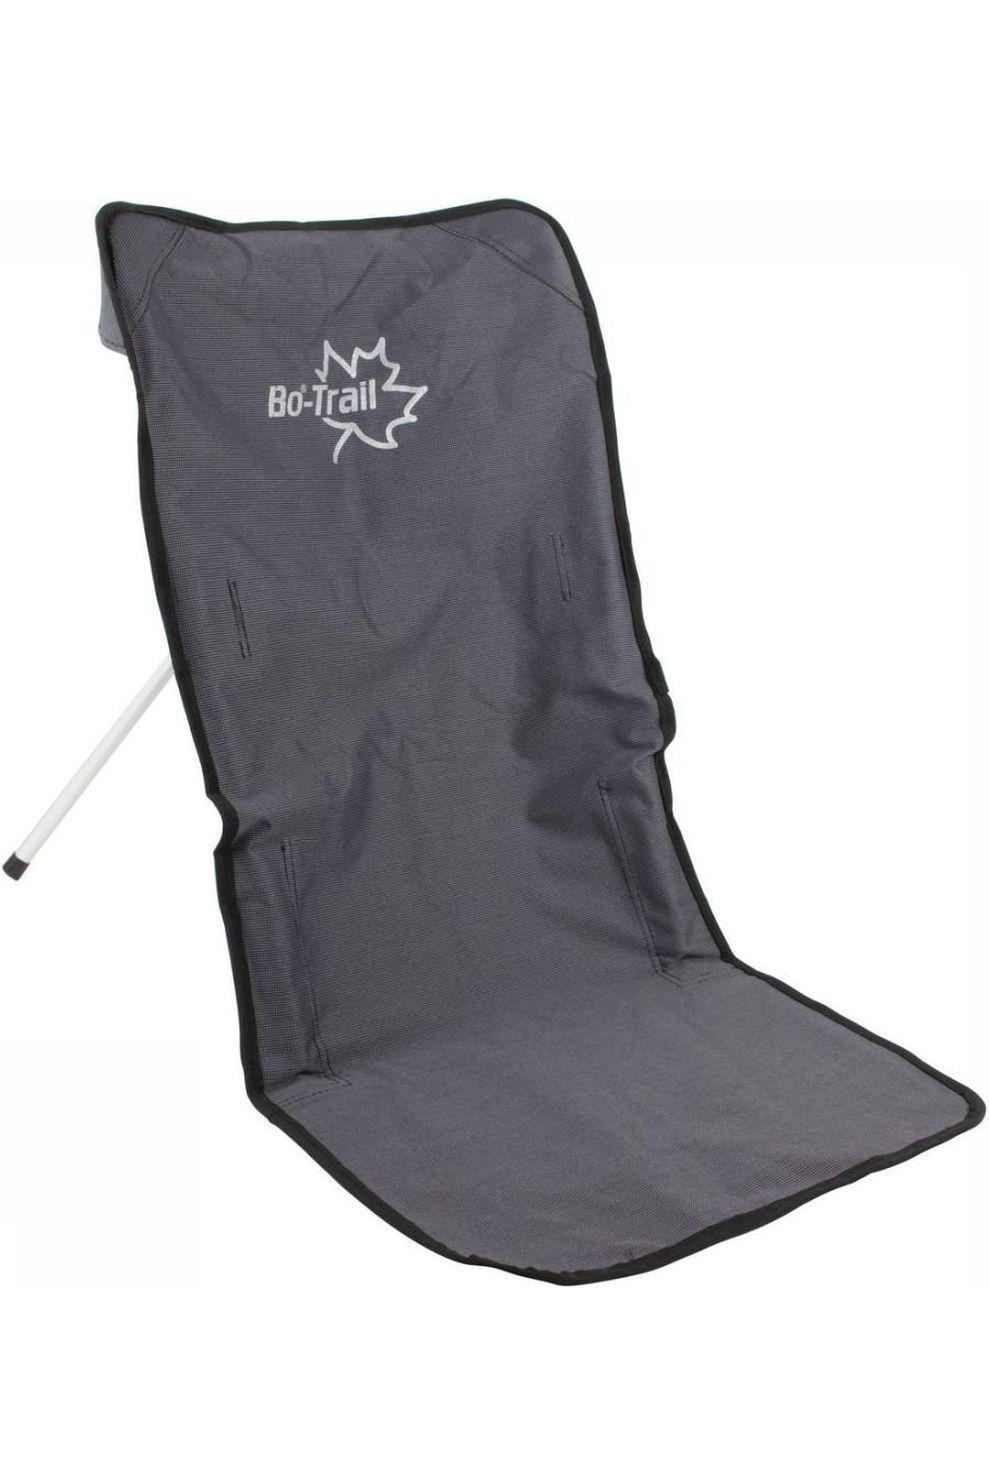 Bo-Trail Reisstoel Compact Backpackers Stoel Oprolbaar - Grijs